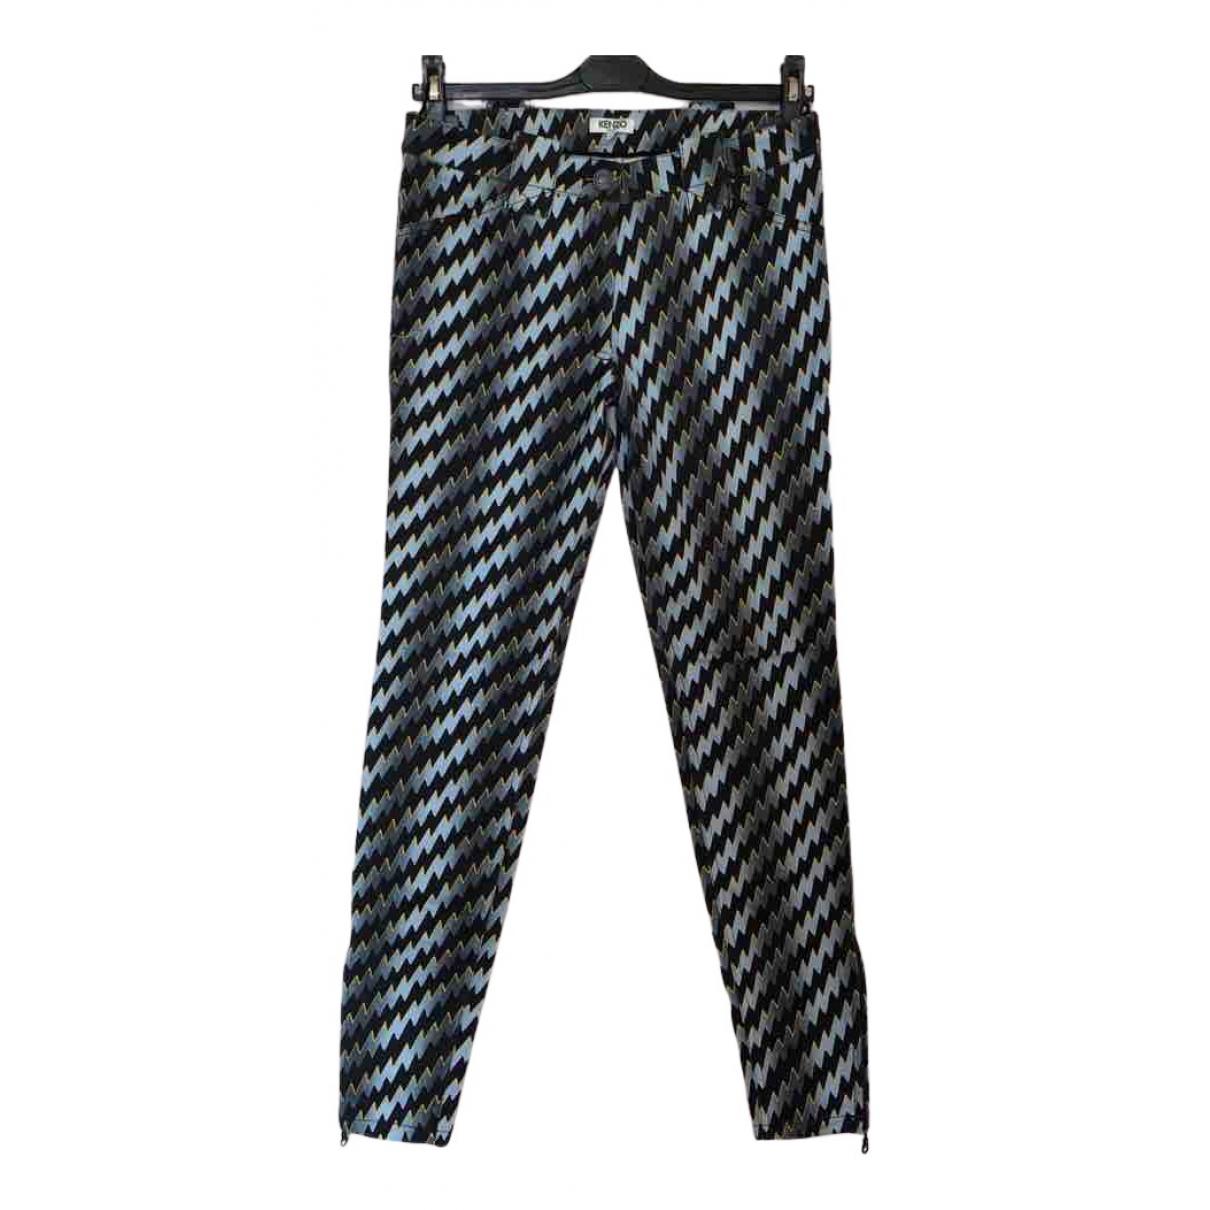 Kenzo N Silver Cotton - elasthane Jeans for Women 32 FR